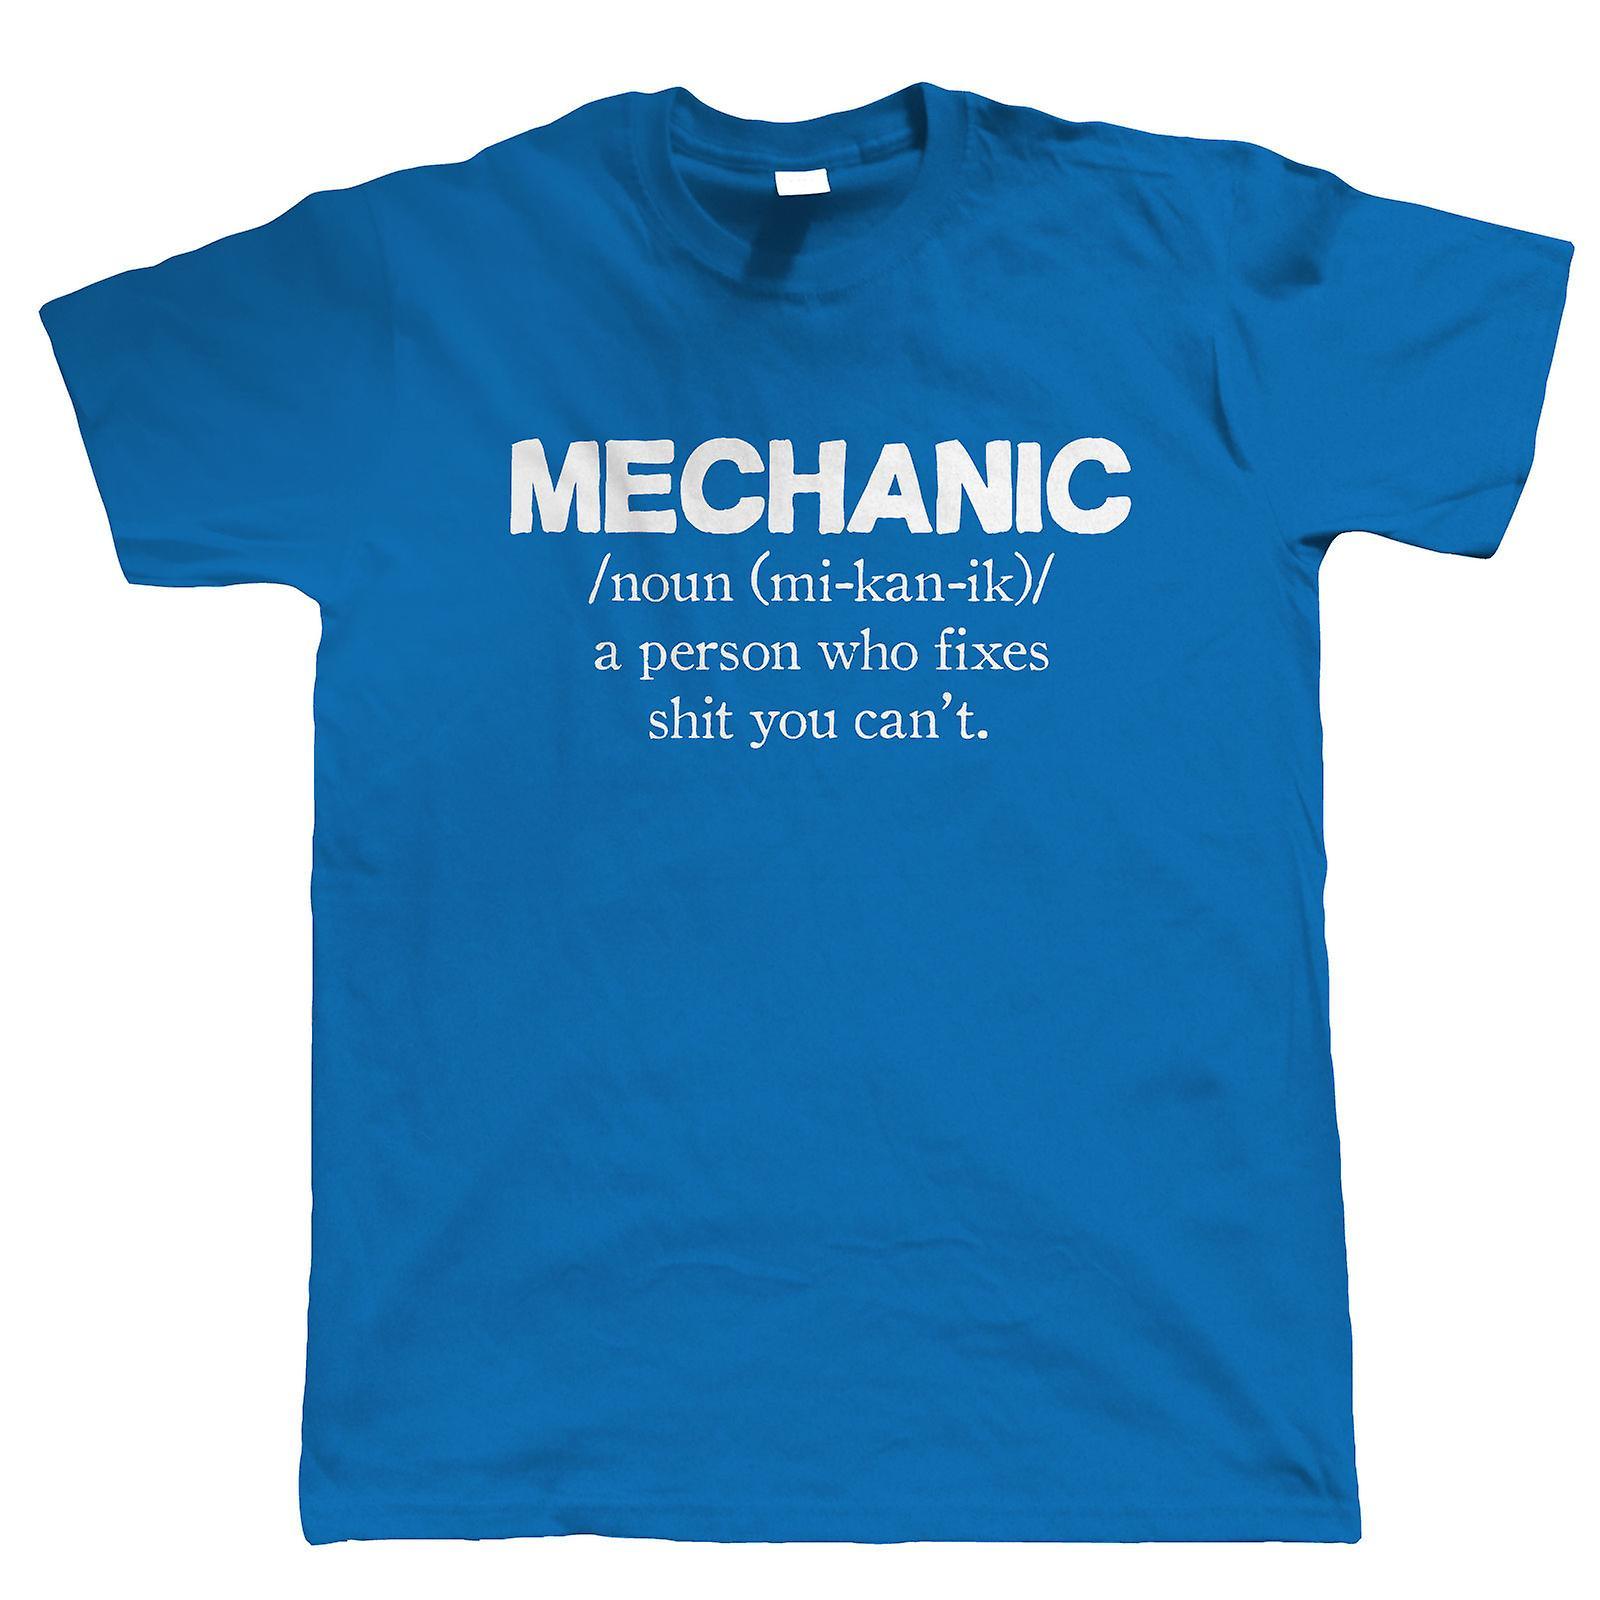 Mechanic Mens Funny T Shirt - Gift for Dad Classic Car Garage